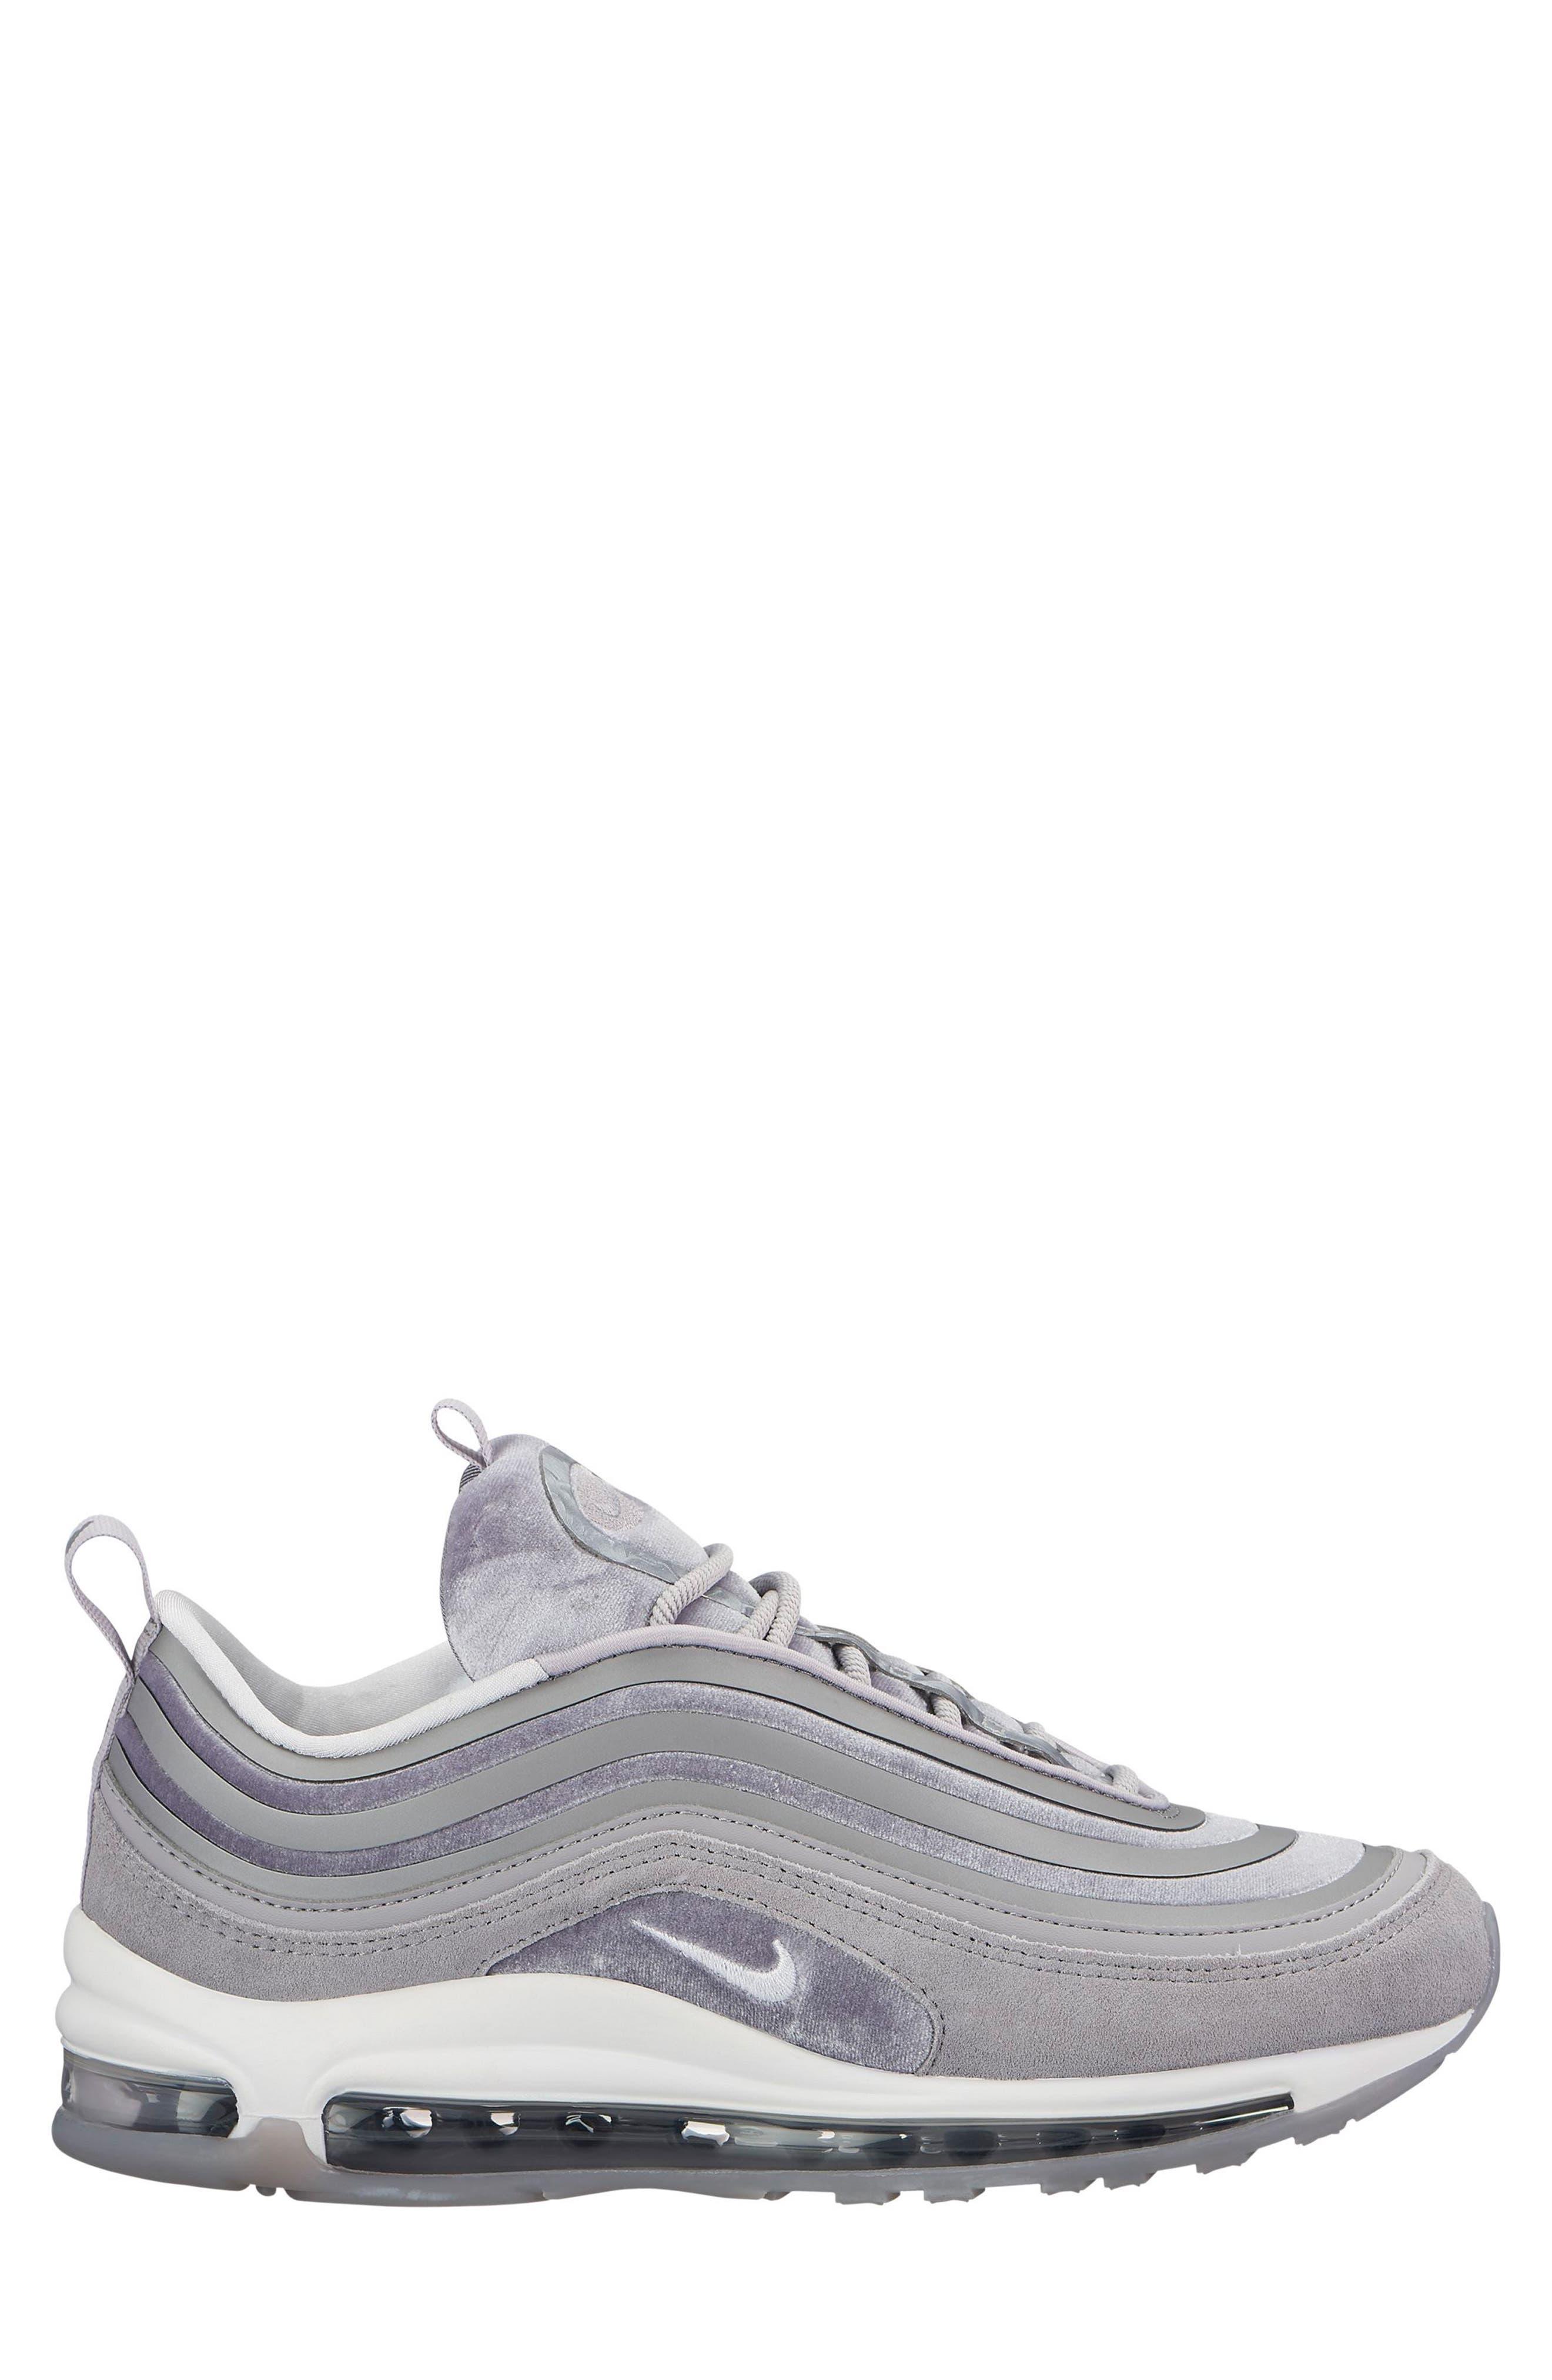 Air Max 97 Ultra '17 LX Sneaker,                             Main thumbnail 1, color,                             021